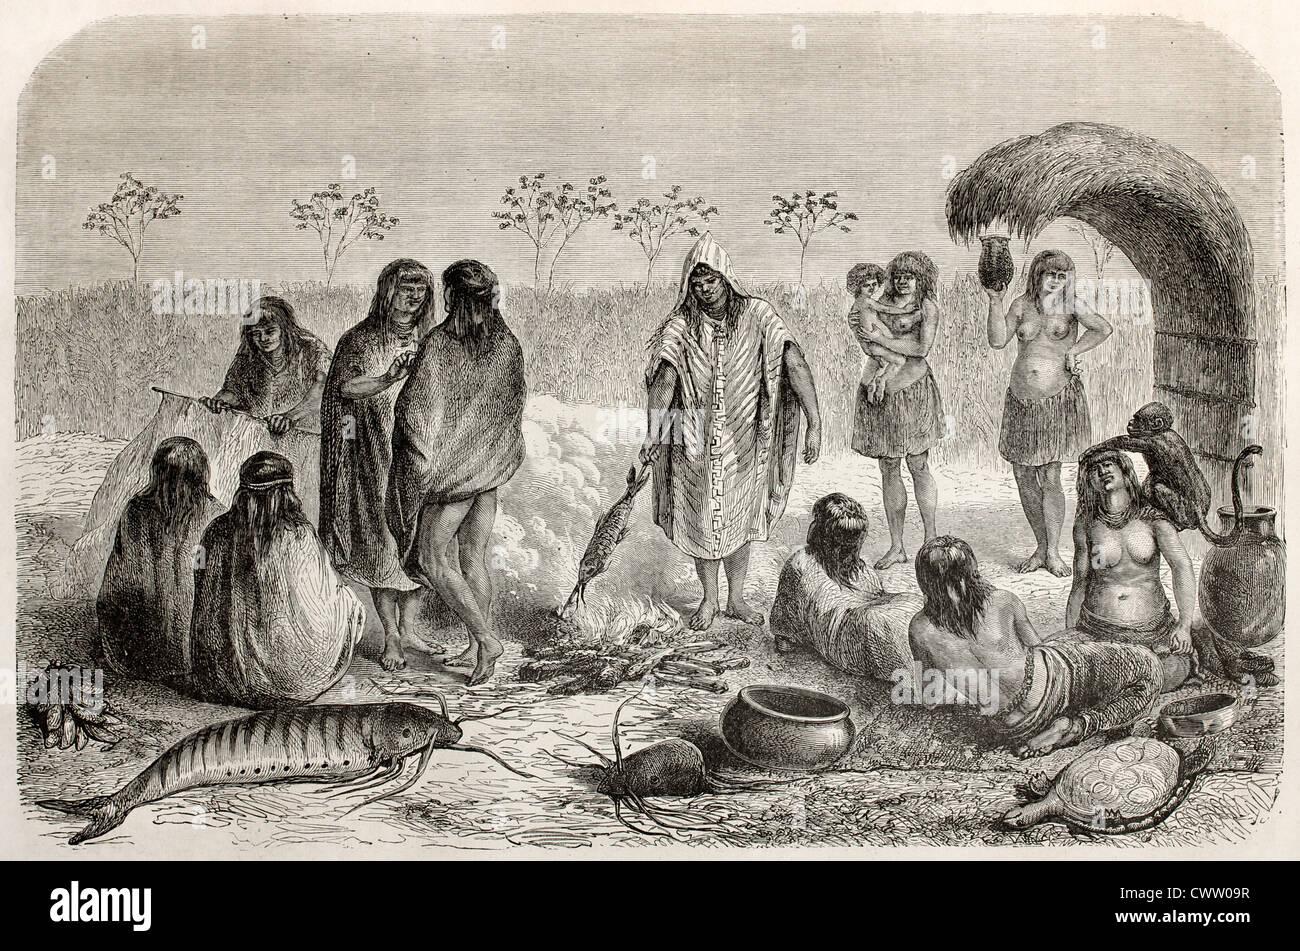 Chontaquiros Peruvian natives fishermen - Stock Image